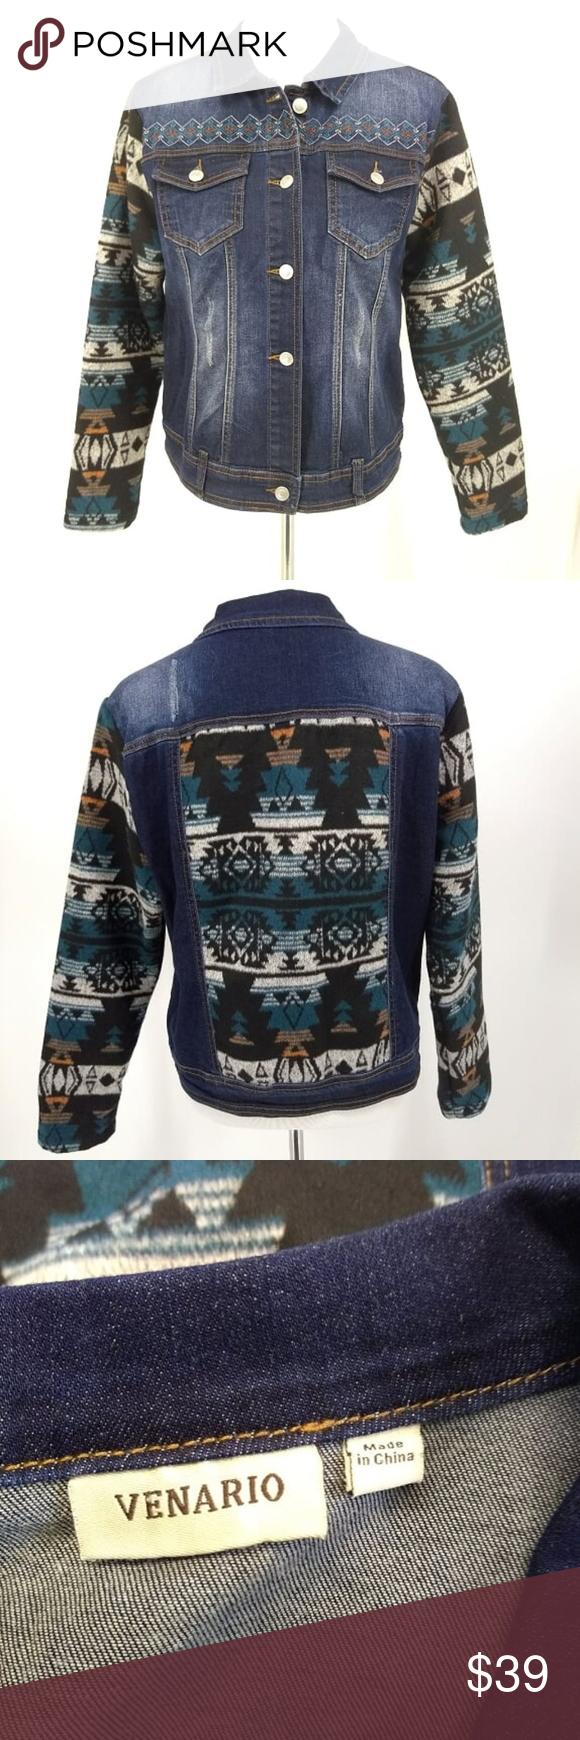 Venario Medium Jean Jacket Native American Fleece Venario Medium Jean Jacket Native American Fleece Sleeves Button Down Clothes Design Fashion Fashion Design [ 1740 x 580 Pixel ]